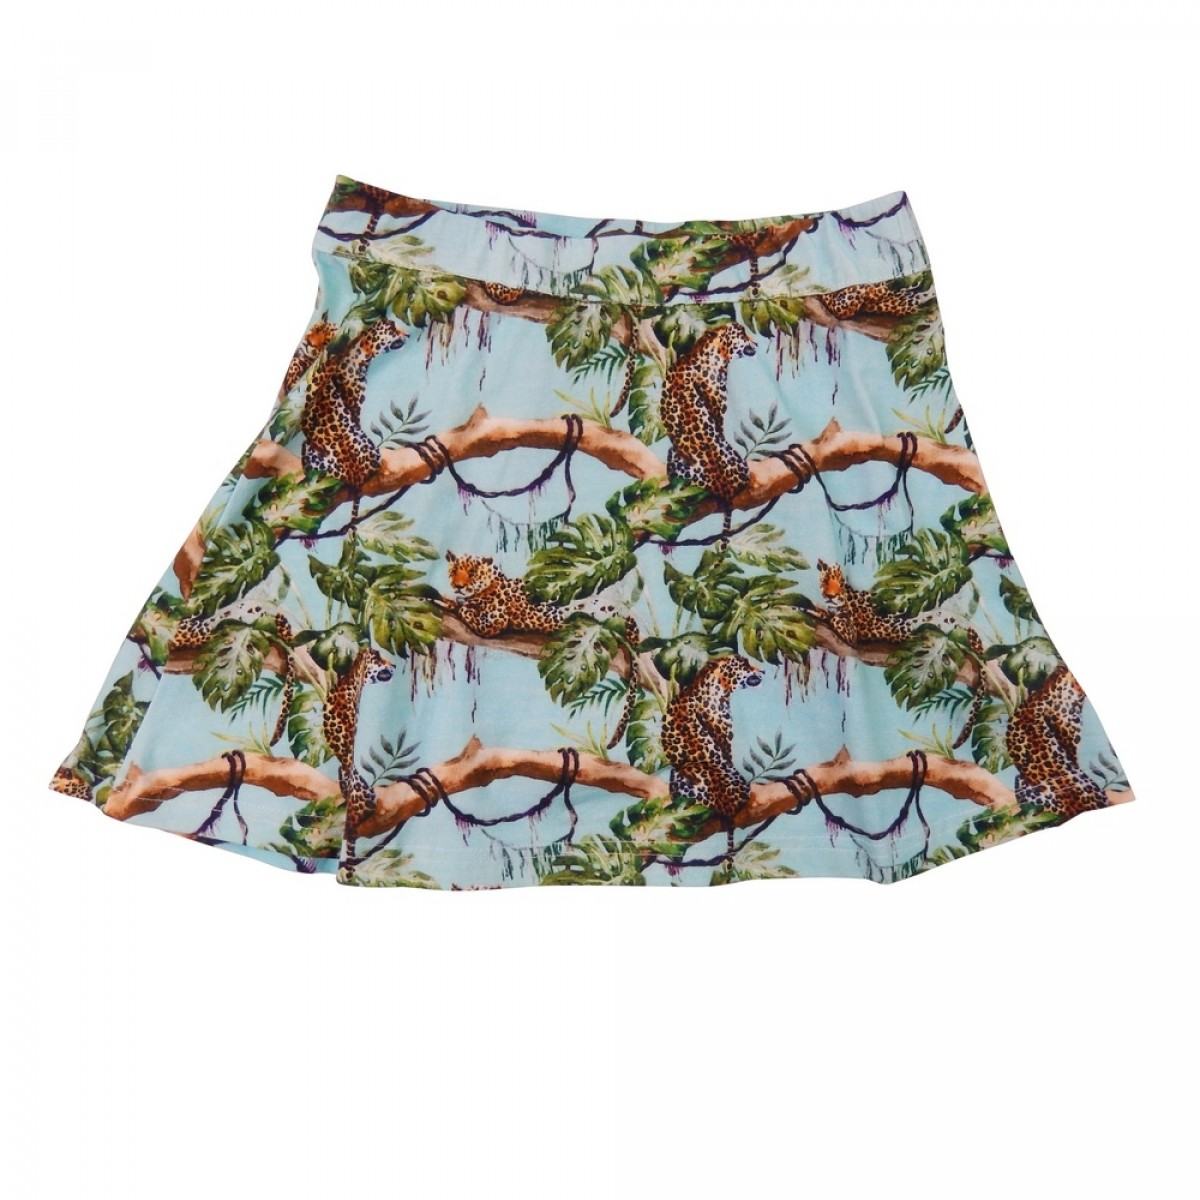 https://myshop.s3-external-3.amazonaws.com/shop3044400.pictures.lovestation22-skirt-lina-multicolor.jpg